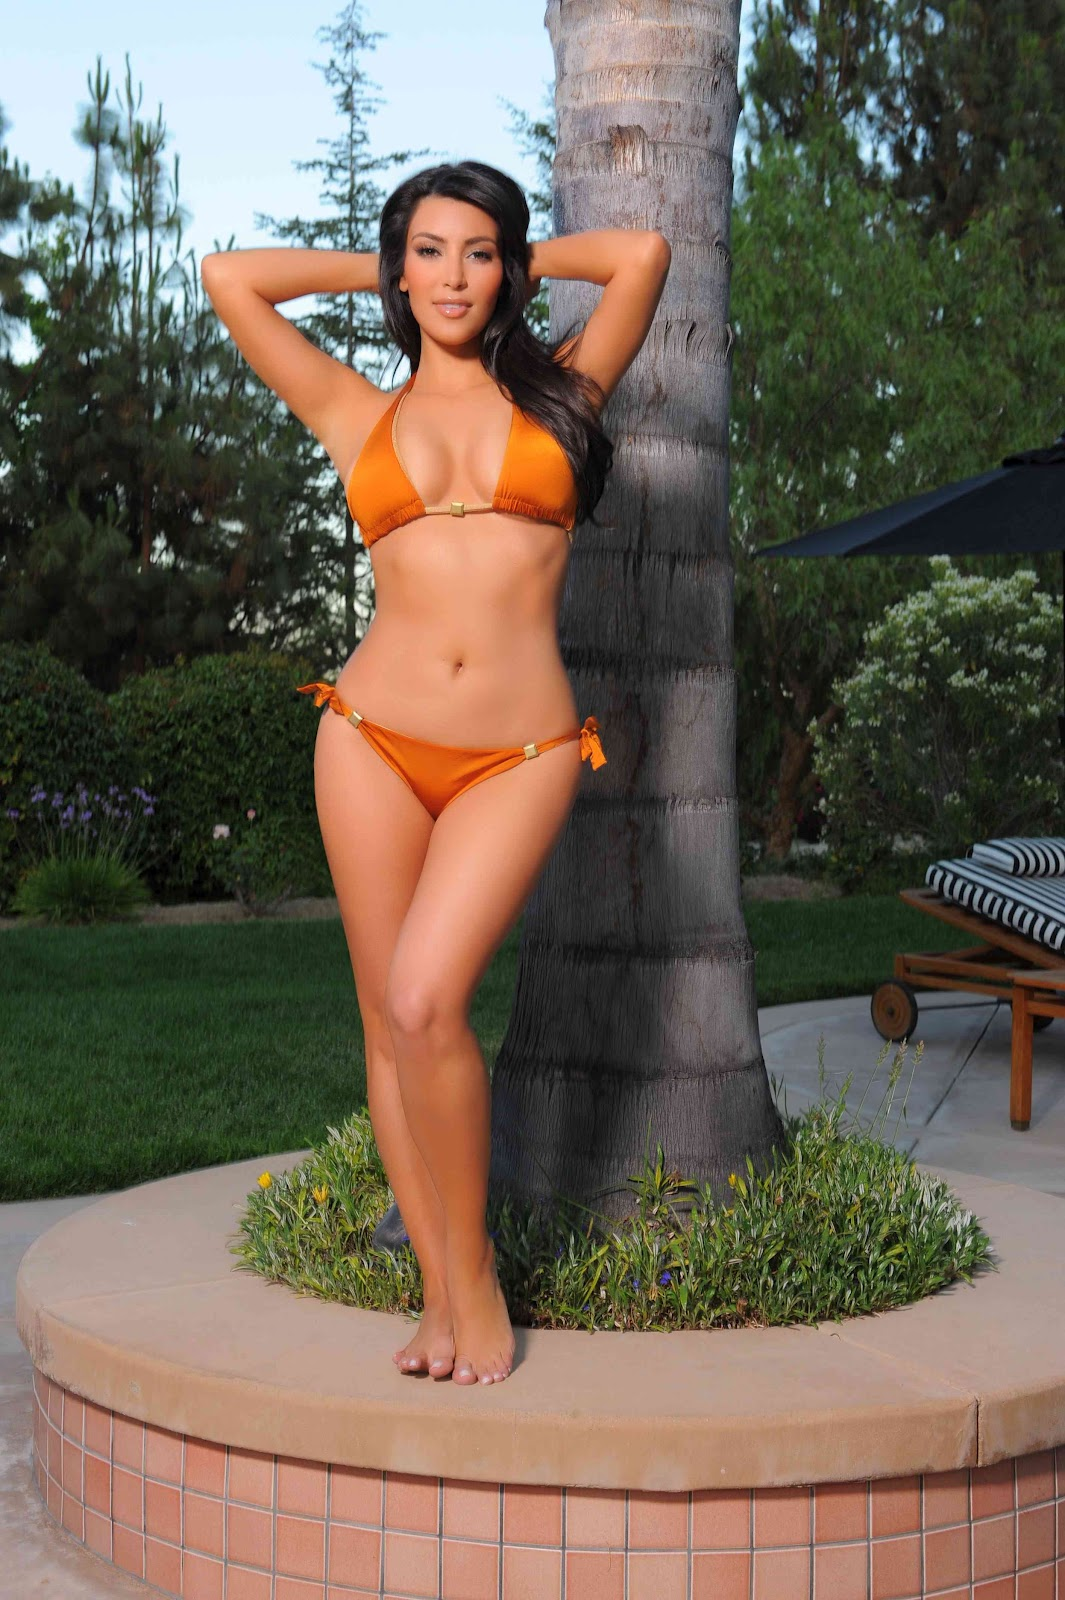 http://2.bp.blogspot.com/-1uLPR7nbWcs/UJHMtuKE-_I/AAAAAAAAdlo/IoEyxD3hLhk/s1600/kim-kardashian-in-bikini.jpg